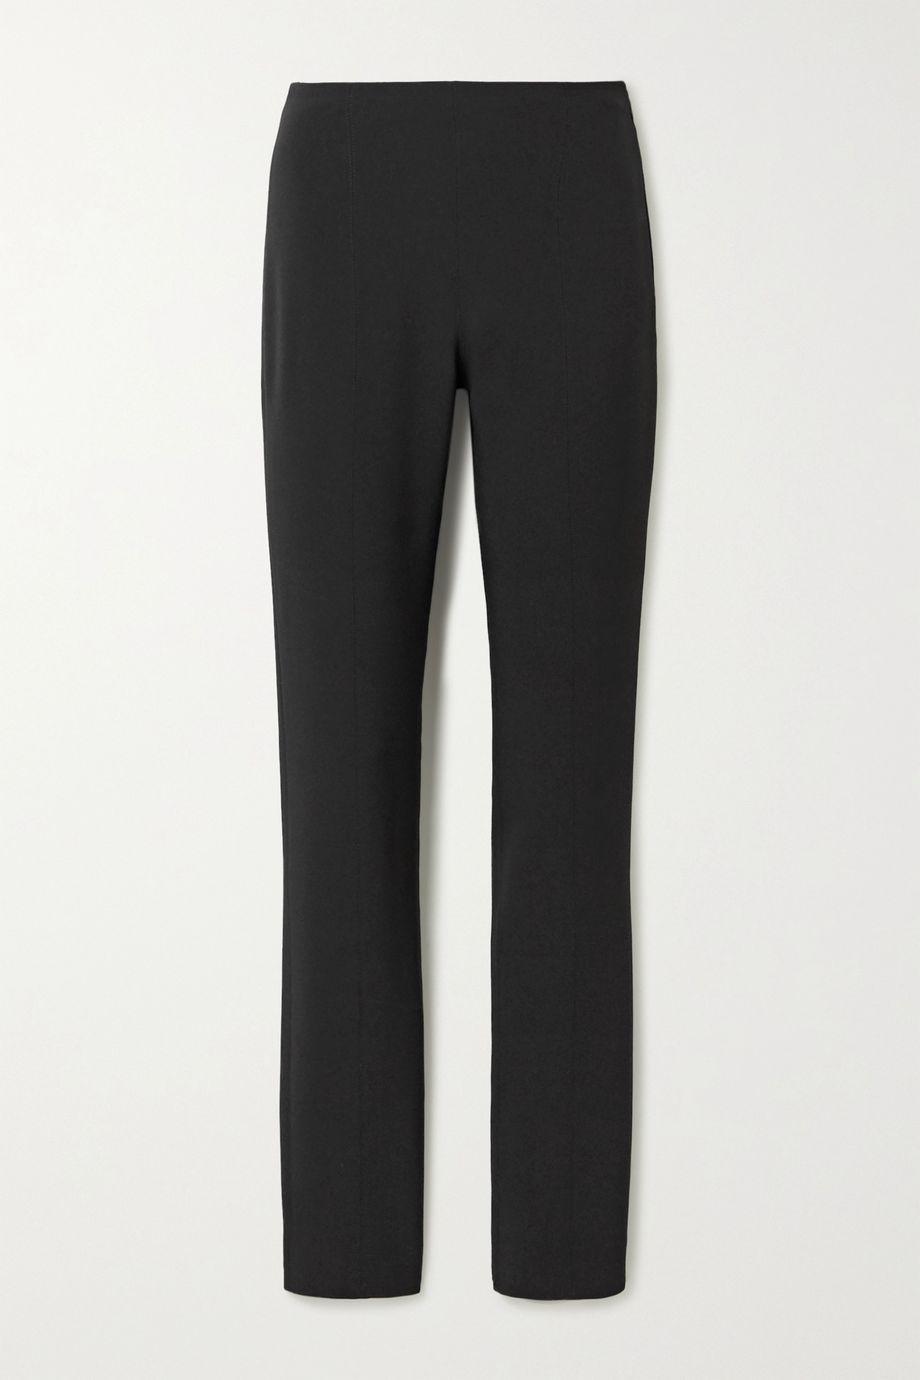 Mugler Stretch-cady slim-fit pants